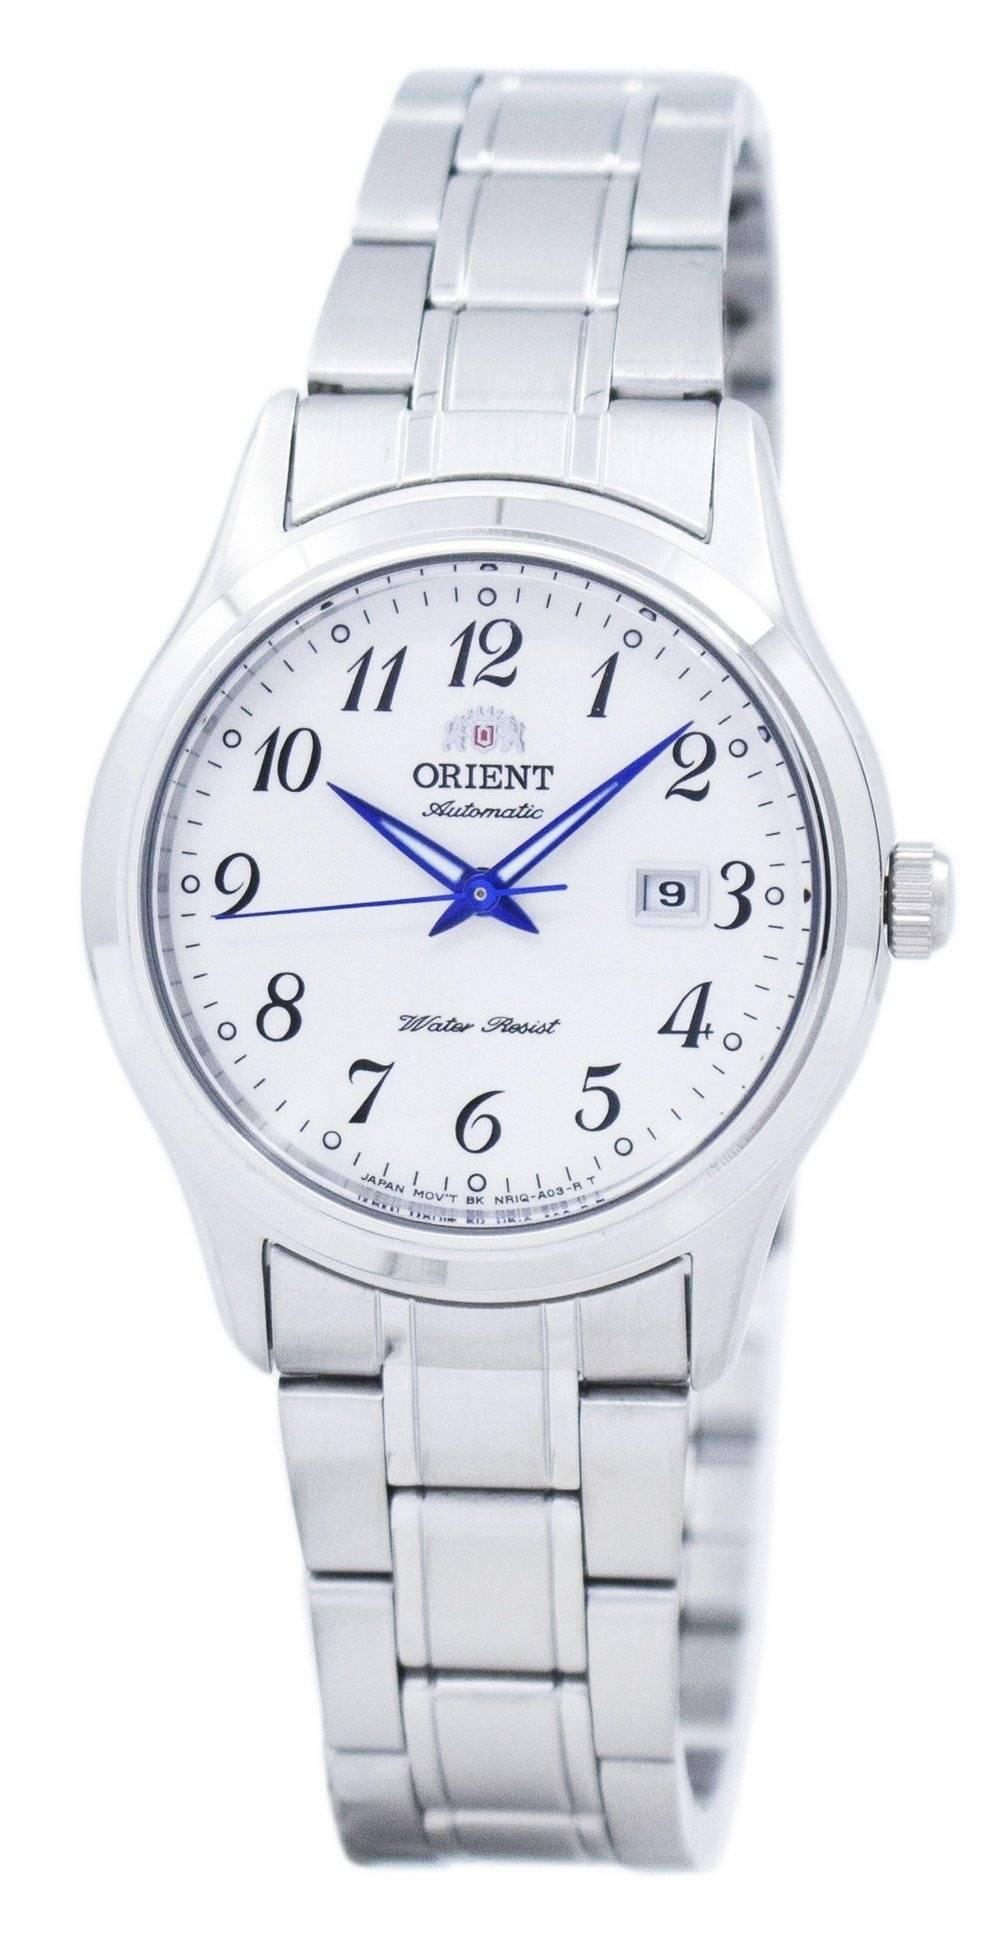 23c998ef74f Orientar a relógio Charlene Classic automático NR1Q00AW feminino pt